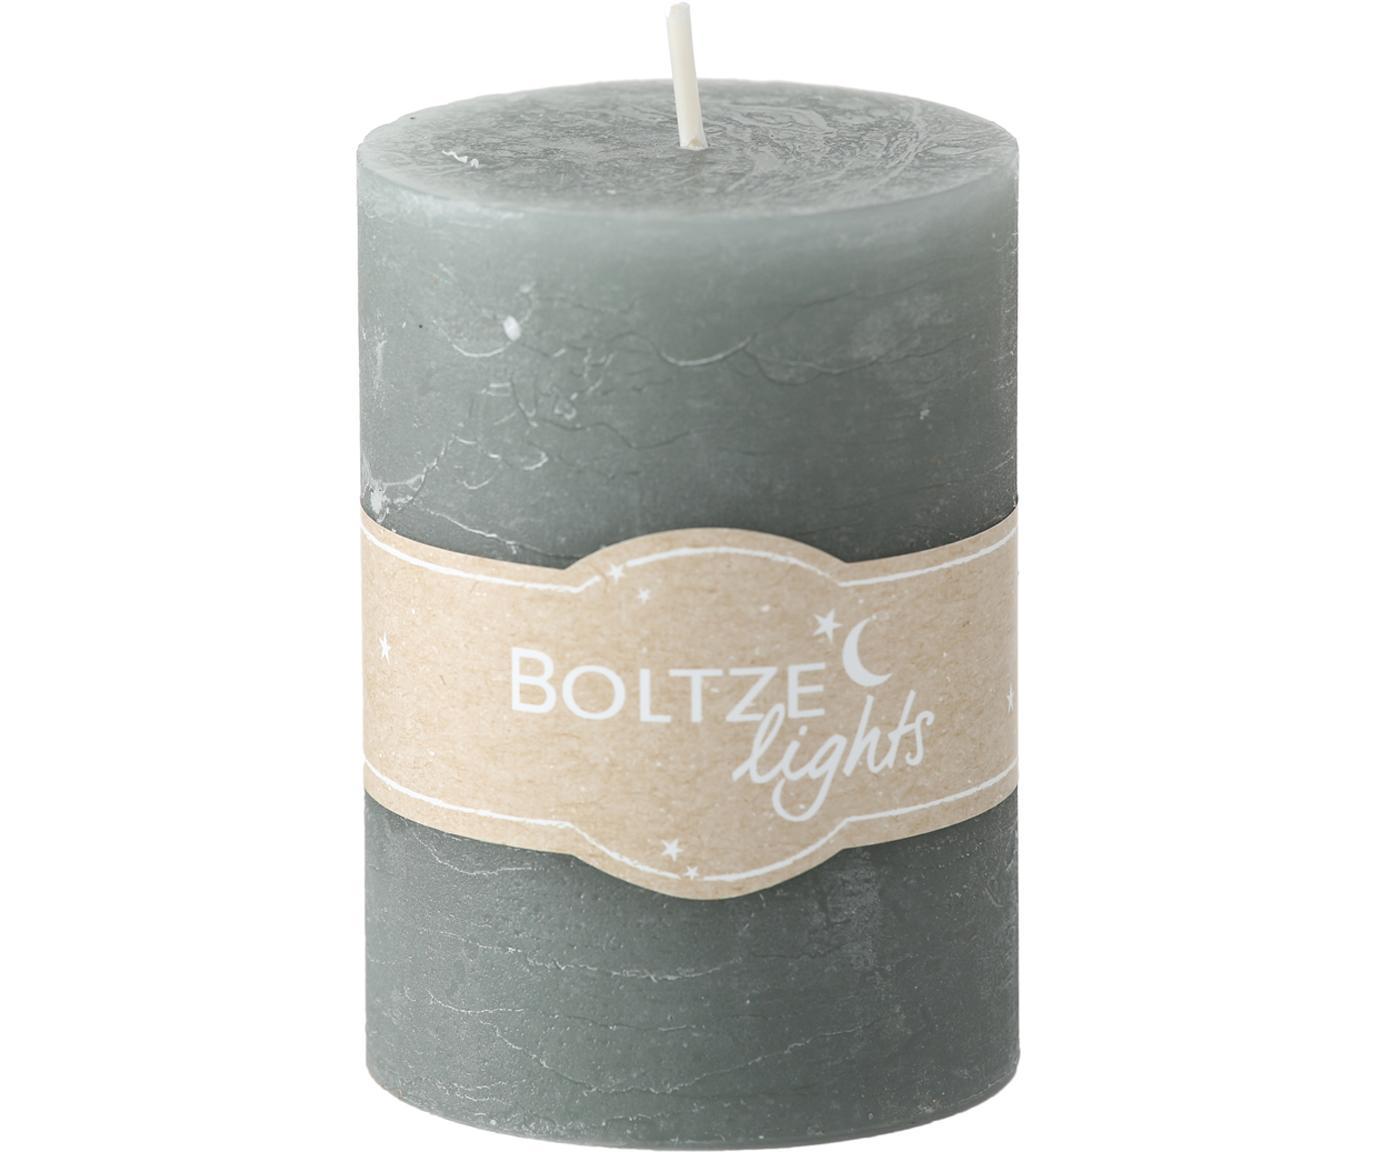 Kerzen-Set Birara, 3-tlg., Blau, Braun, Cremefarben, Ø 7 x H 10 cm